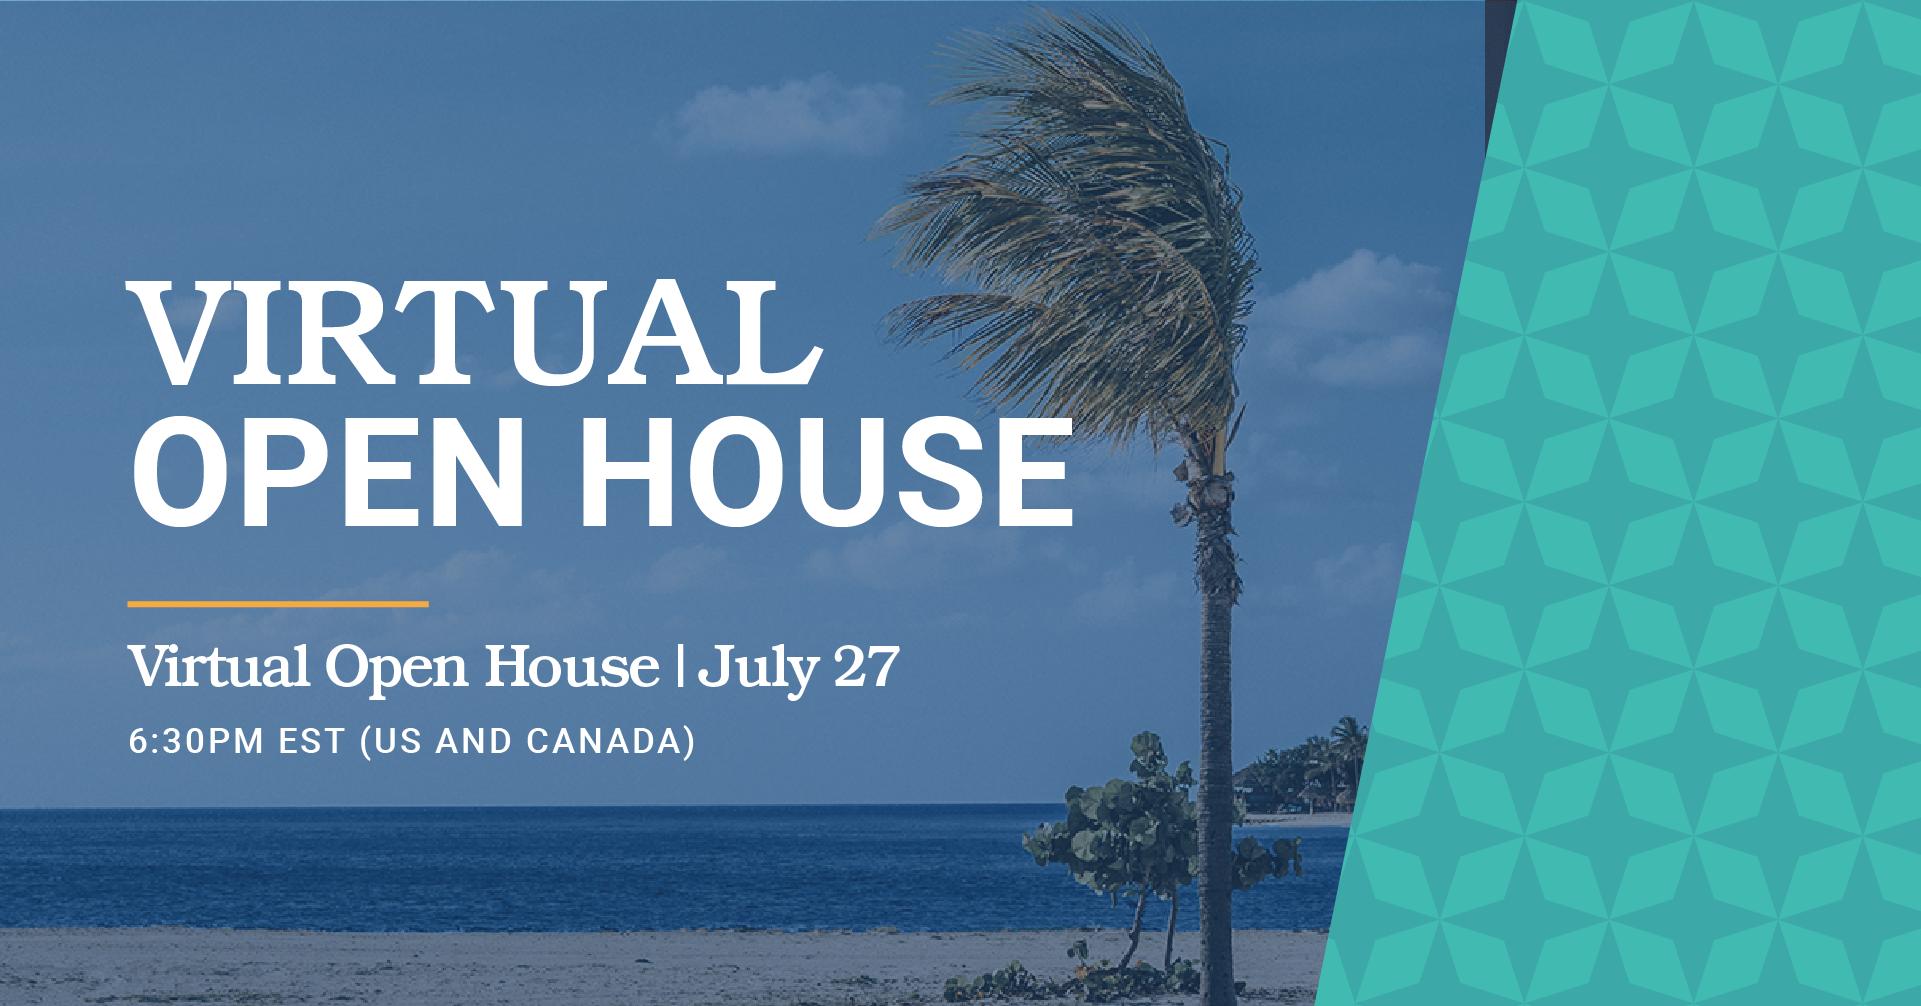 Virtual Open House - Zoom - July 27 - 6:30pm EST